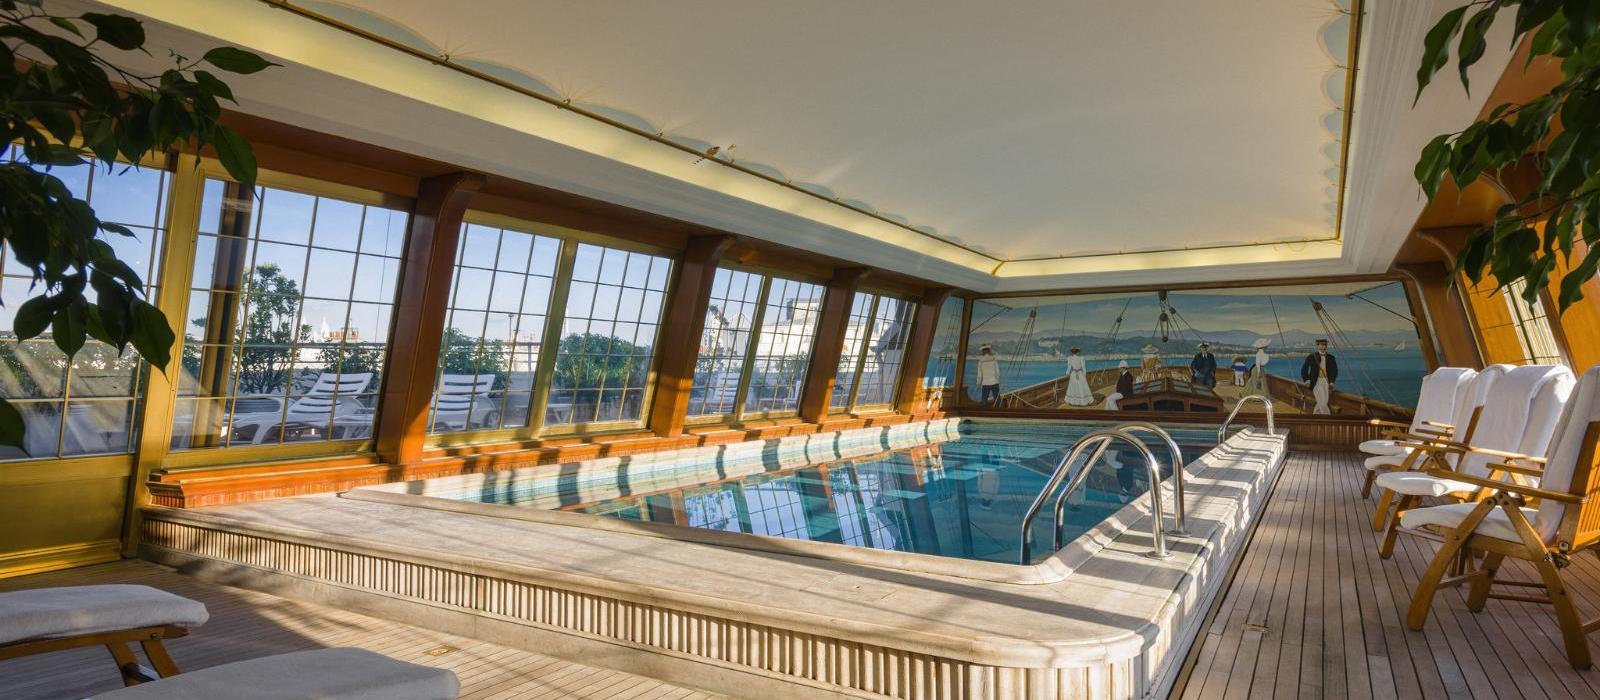 巴黎勒布里斯托酒店(Le Bristol Paris, Oetker Collection) 图片  www.lhw.cn